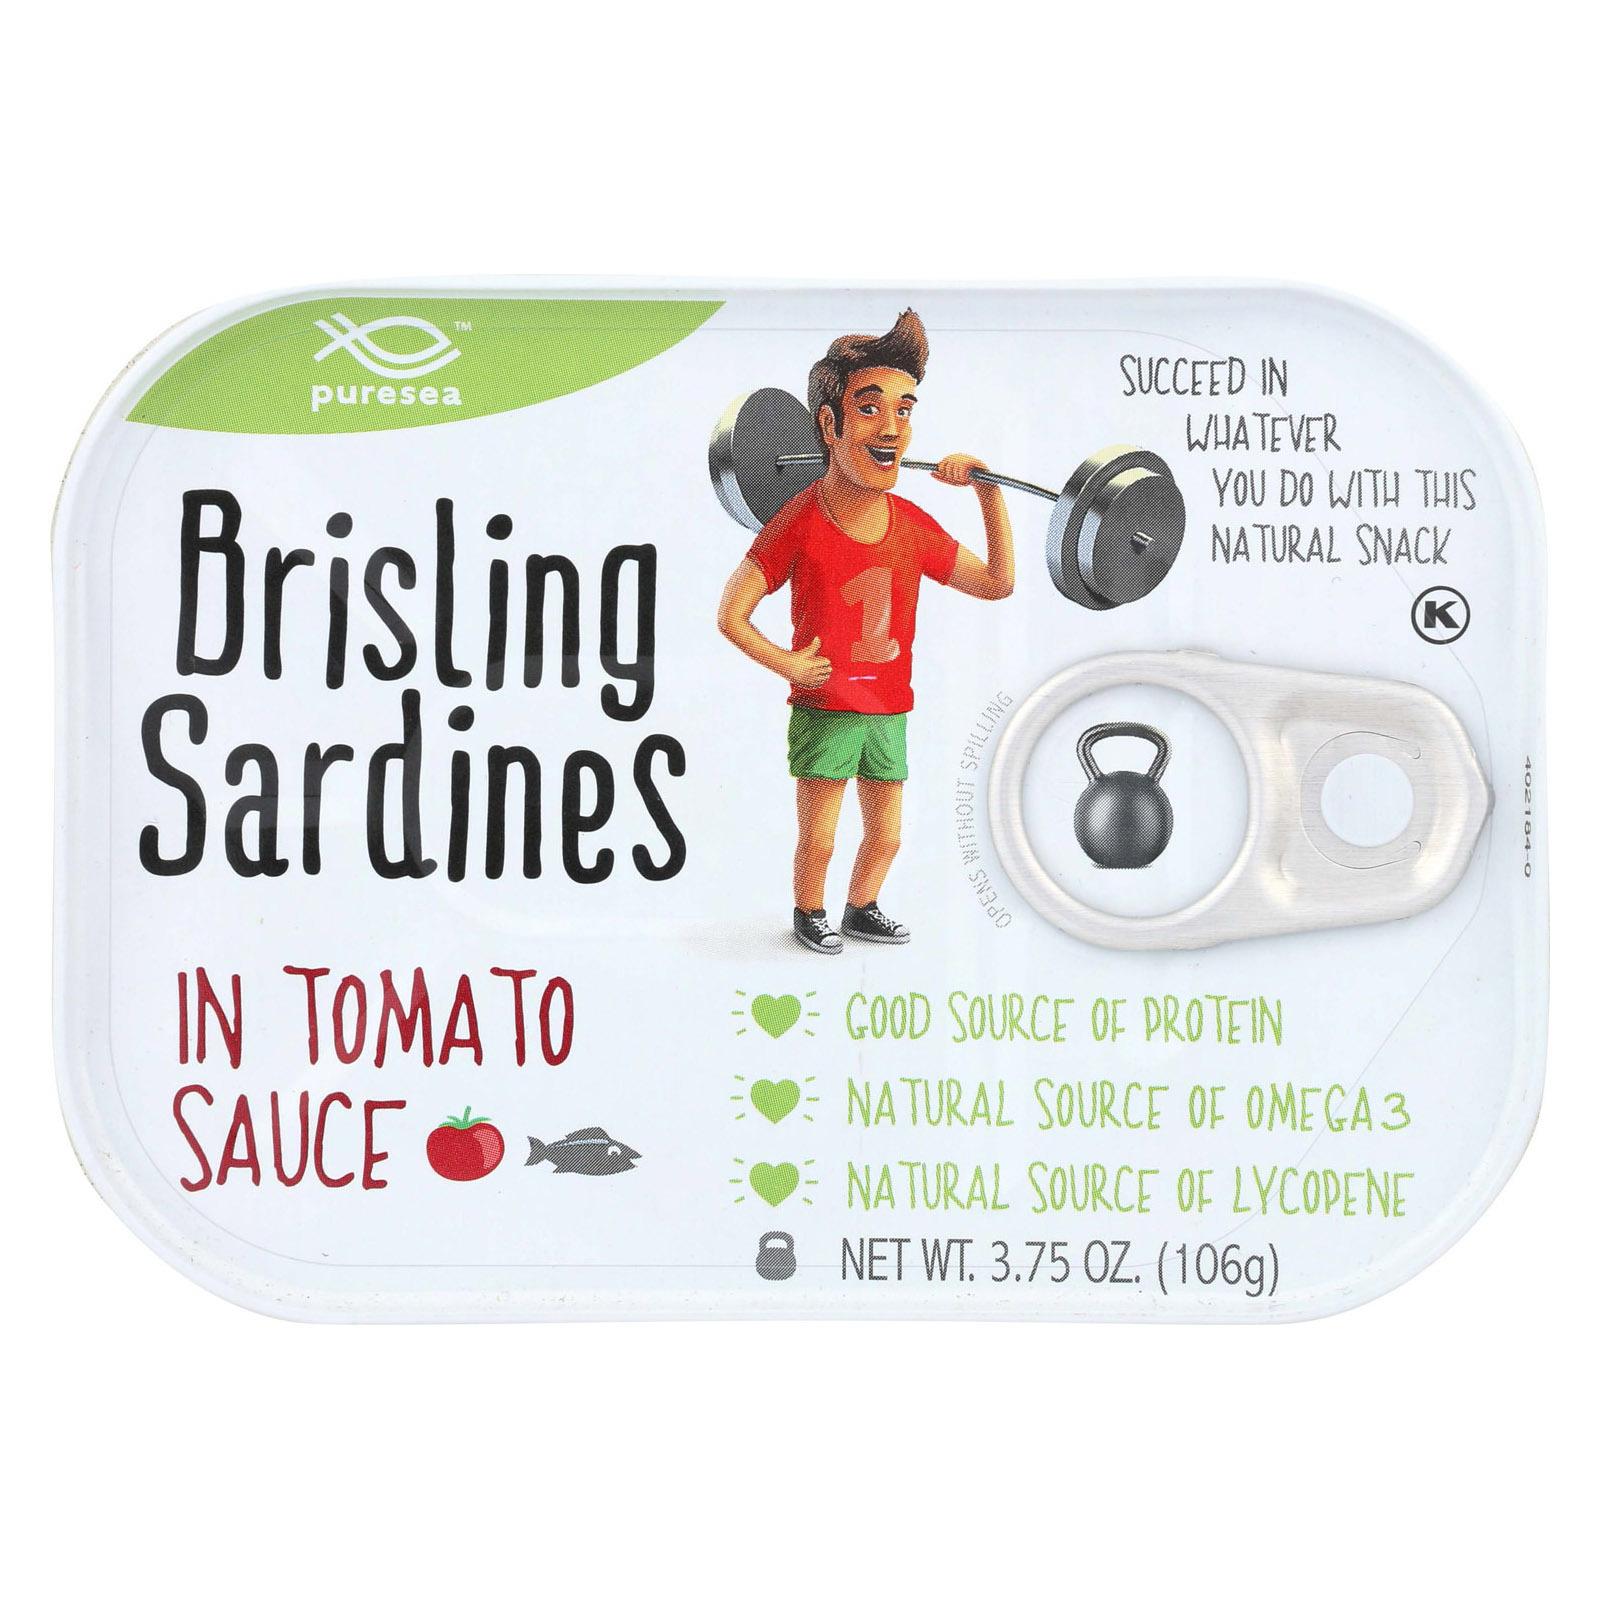 Pure Sea Sardines - Brisling - Tom Sce - Case of 12 - 3.75 oz